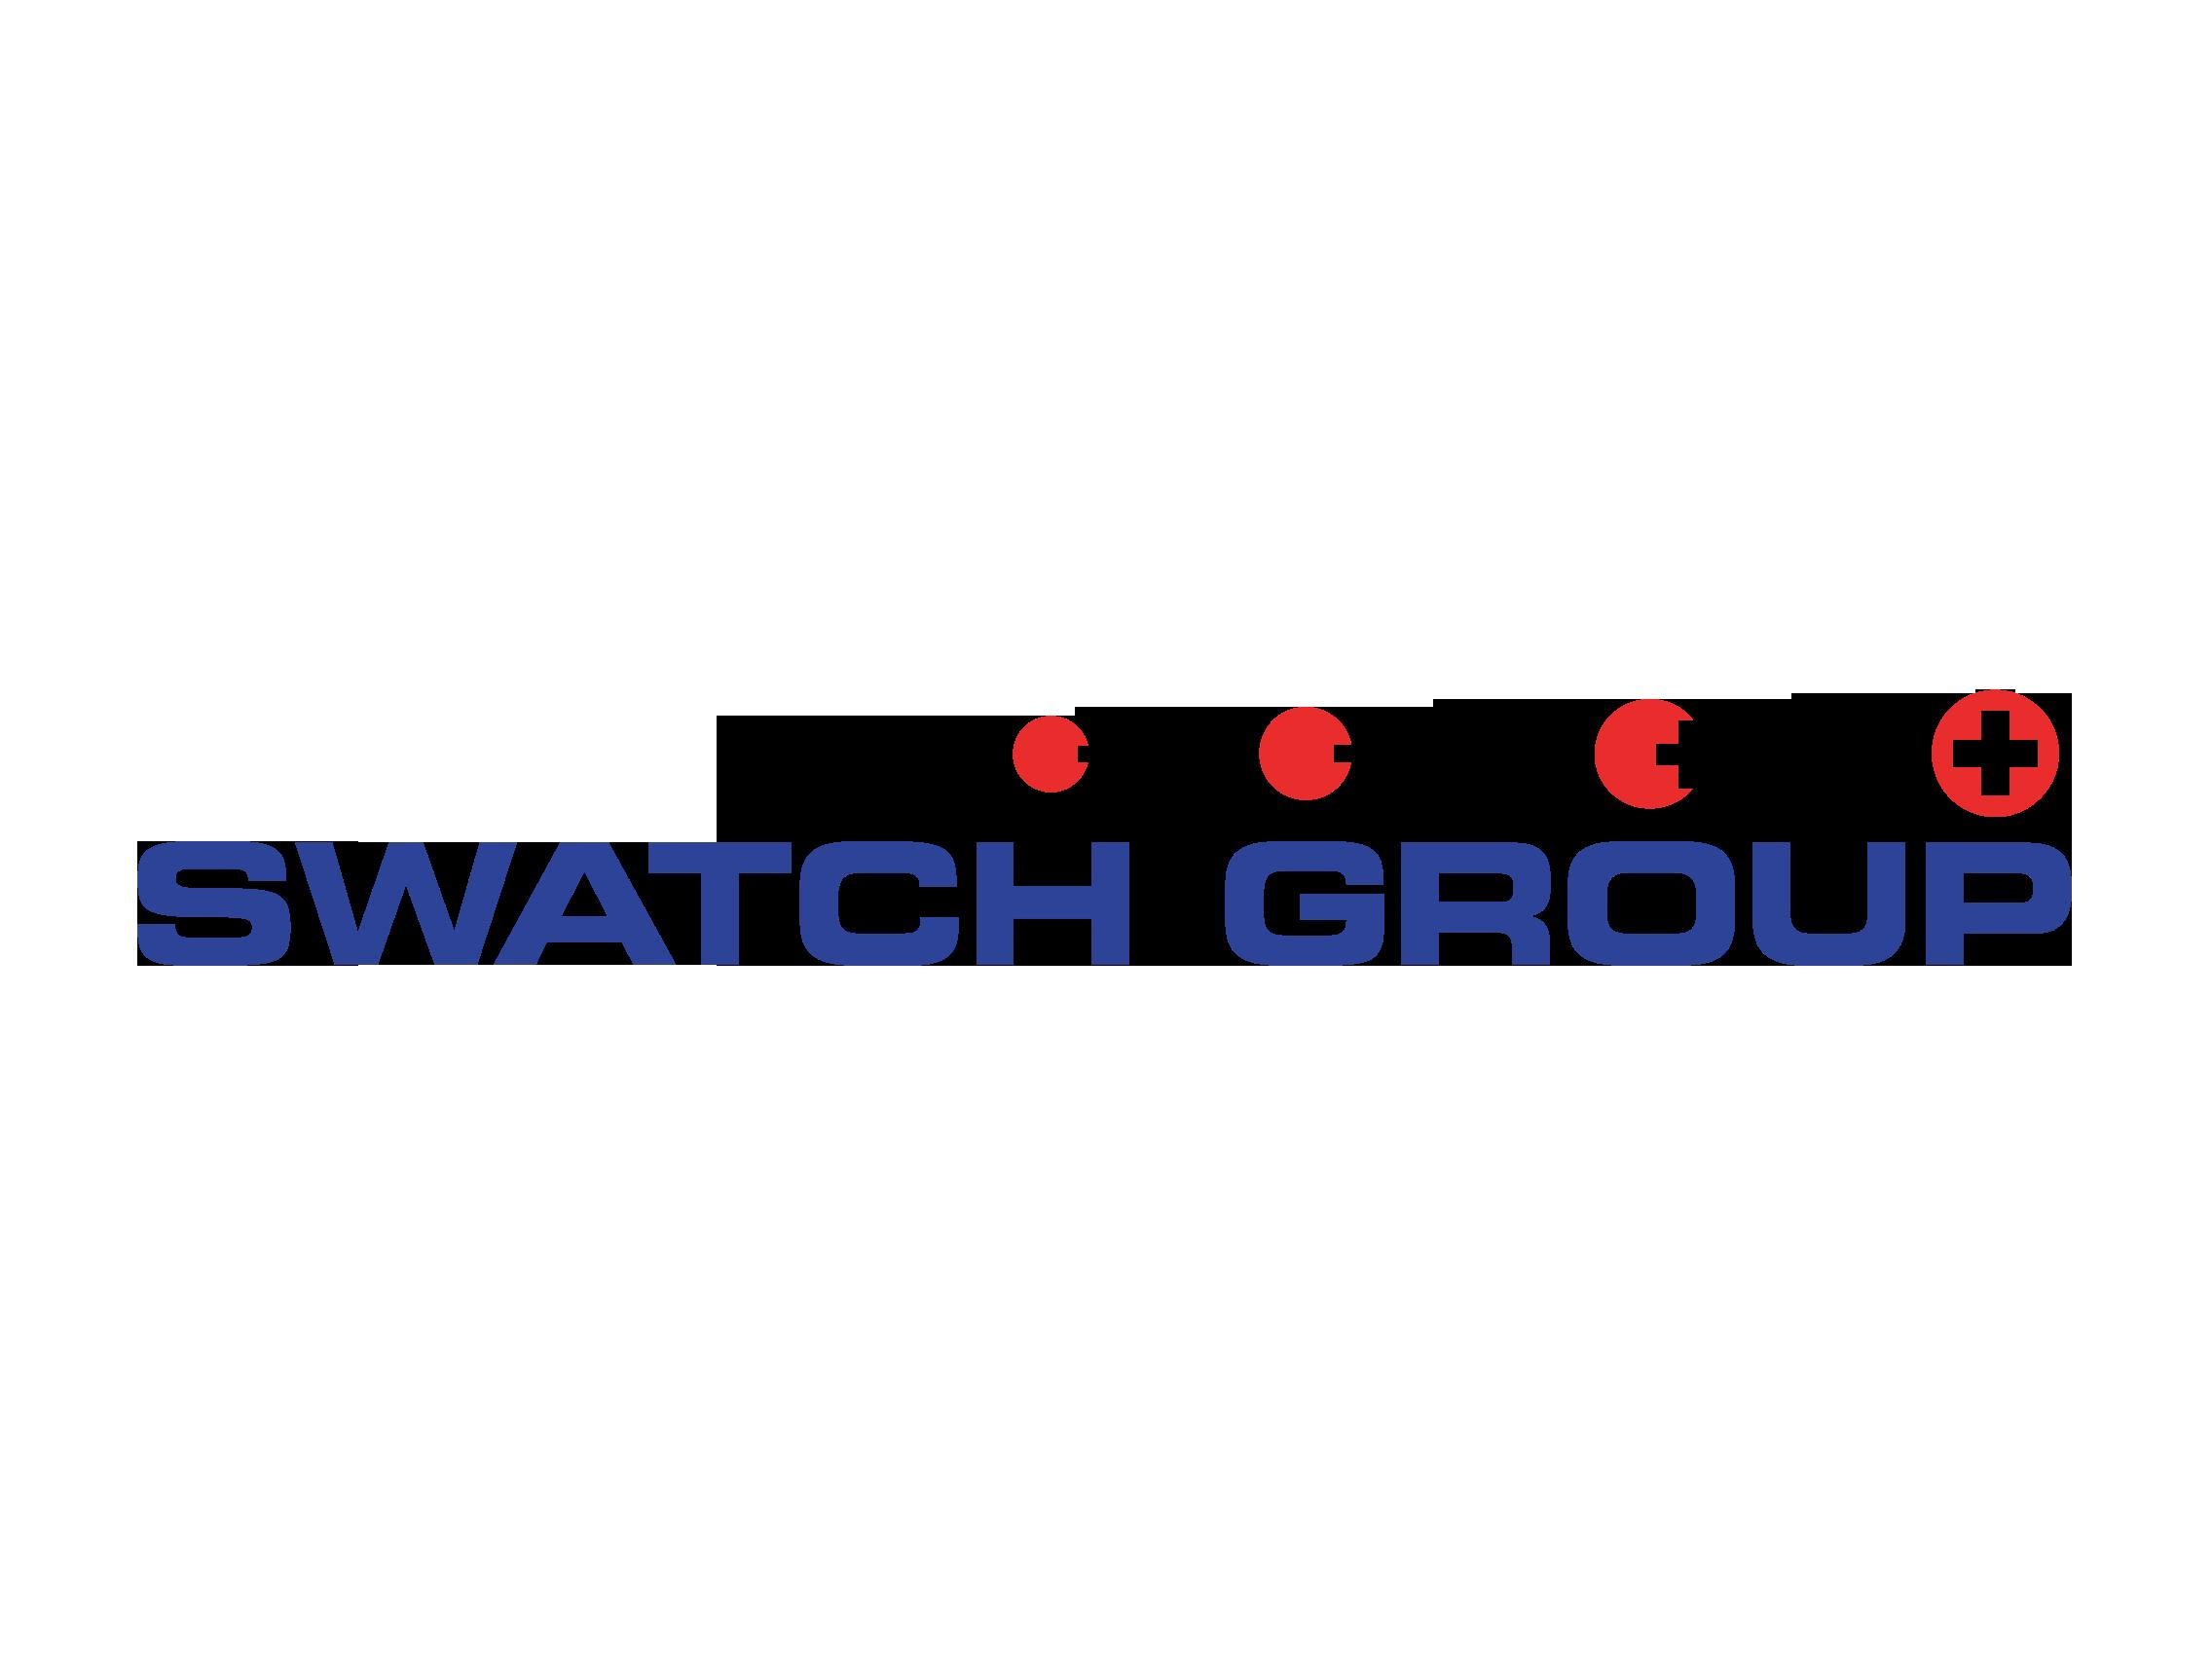 Logo Swatch Group